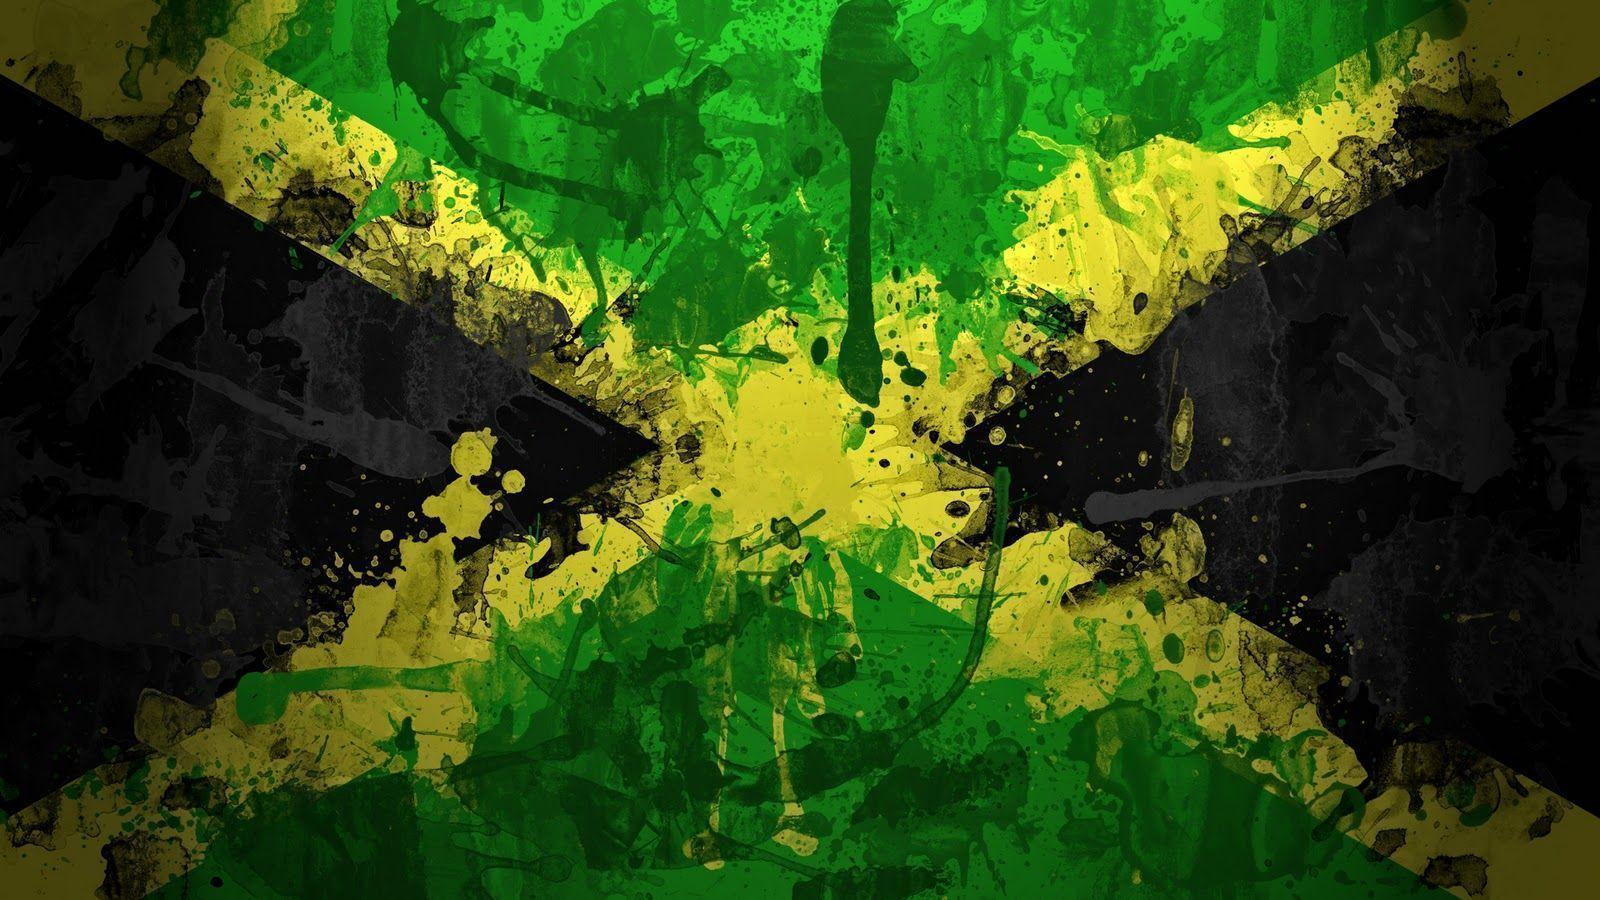 Jamaica Flag Wallpapers   Top Jamaica Flag Backgrounds 1600x900